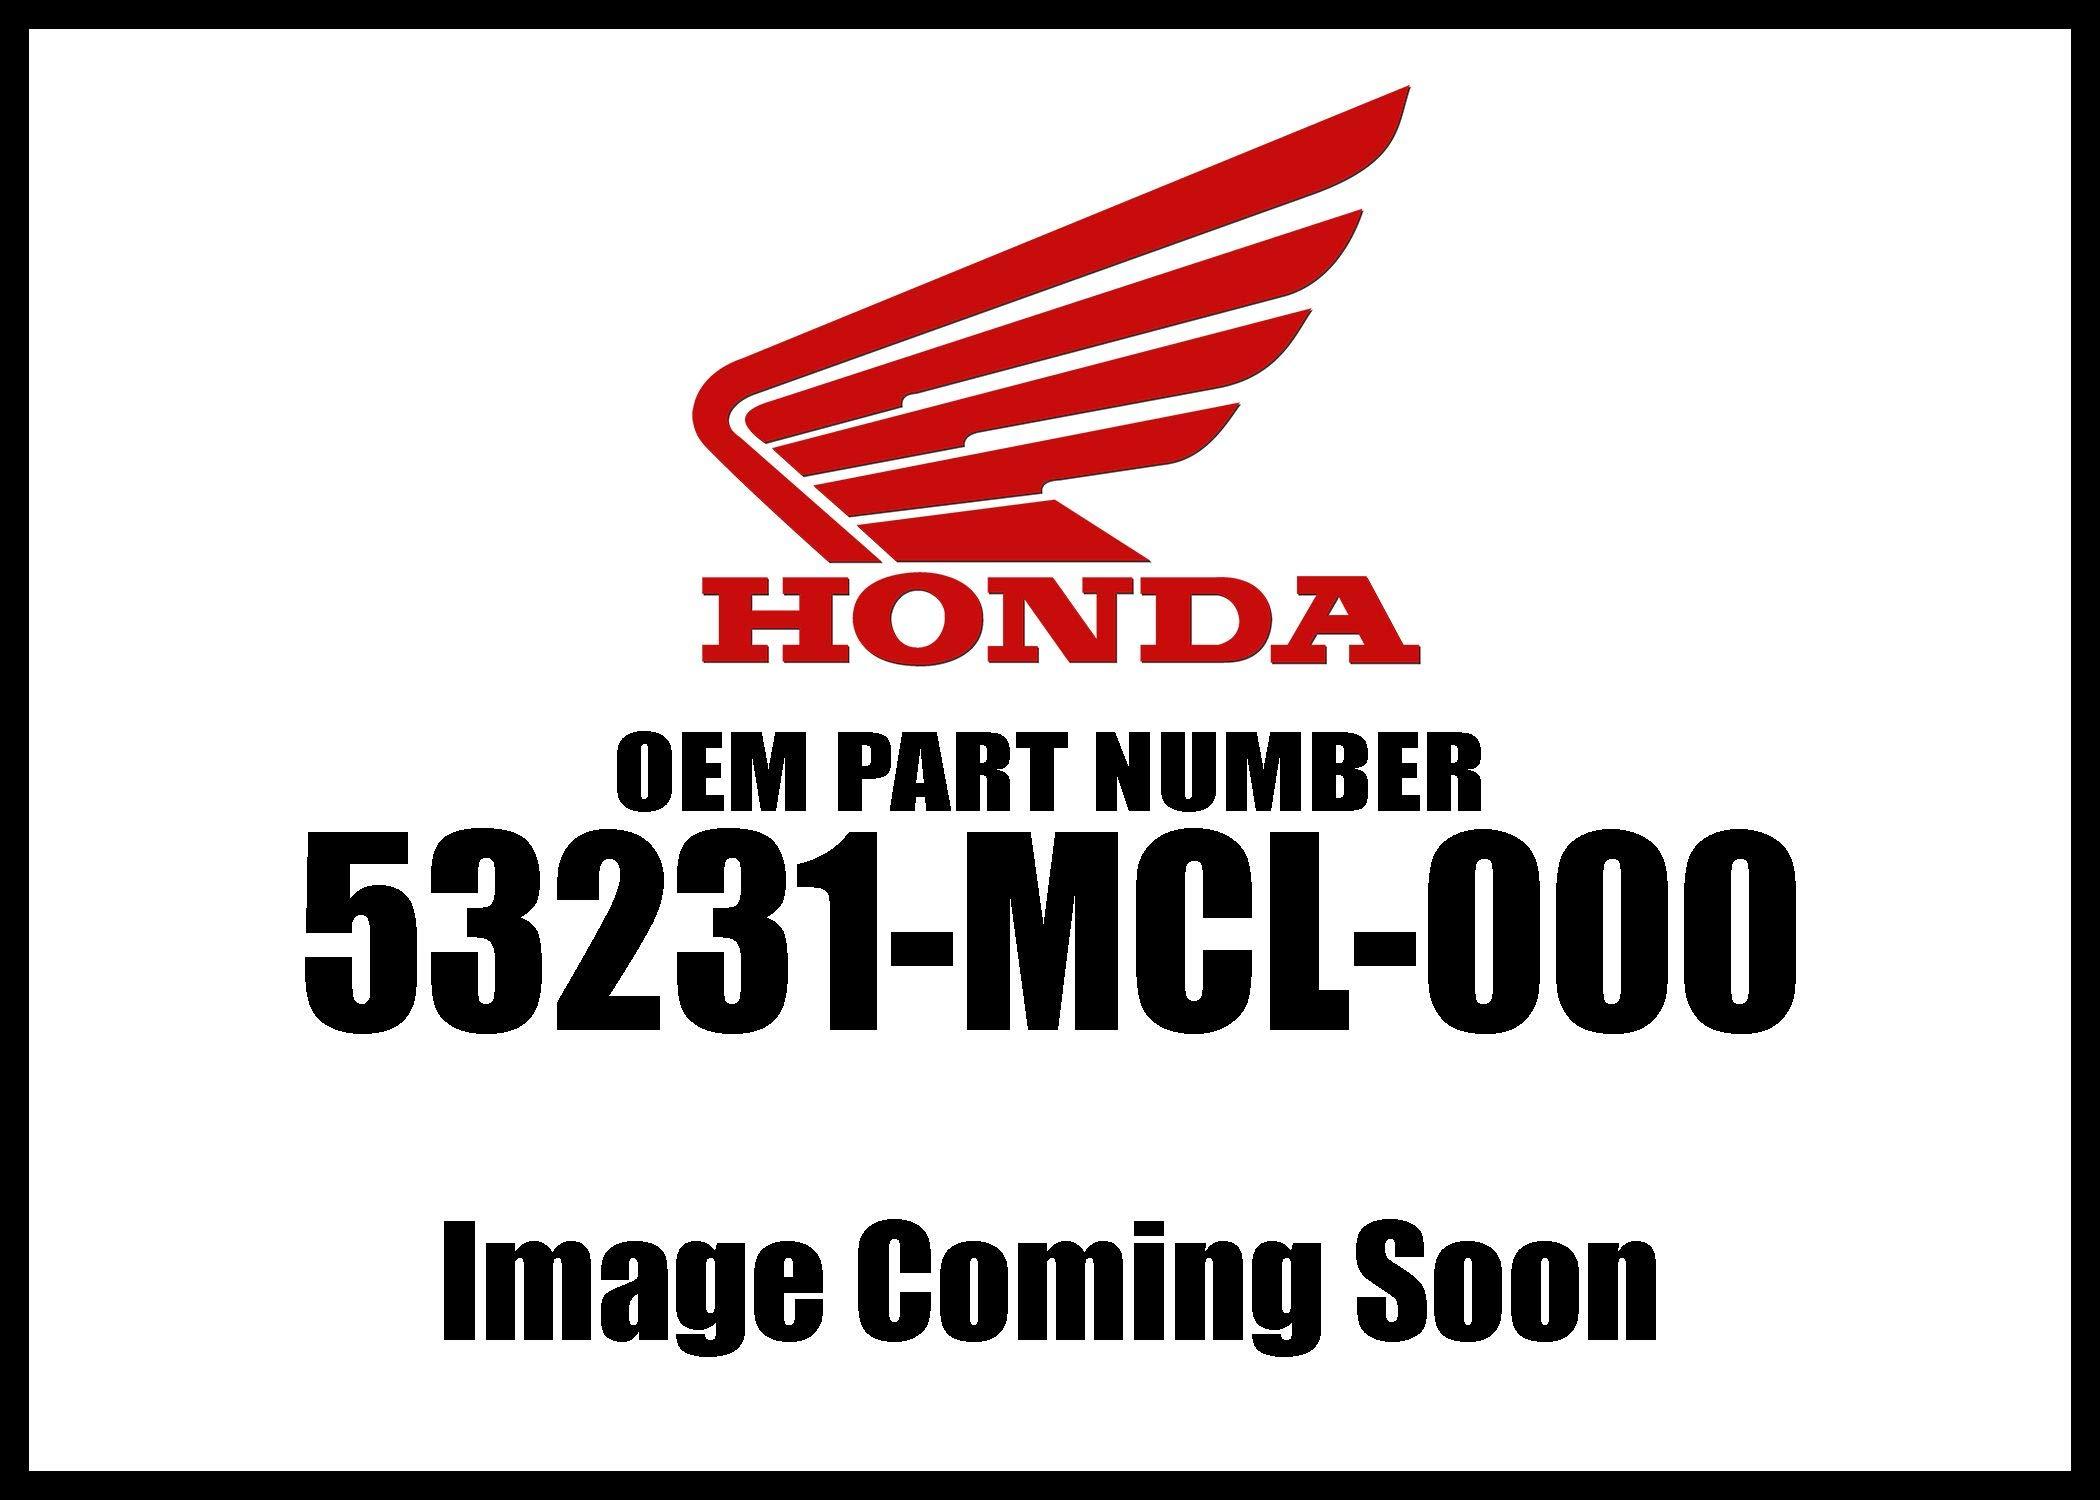 HONDA 53231-MCL-000 HLDR, HANDLE (LOWER)